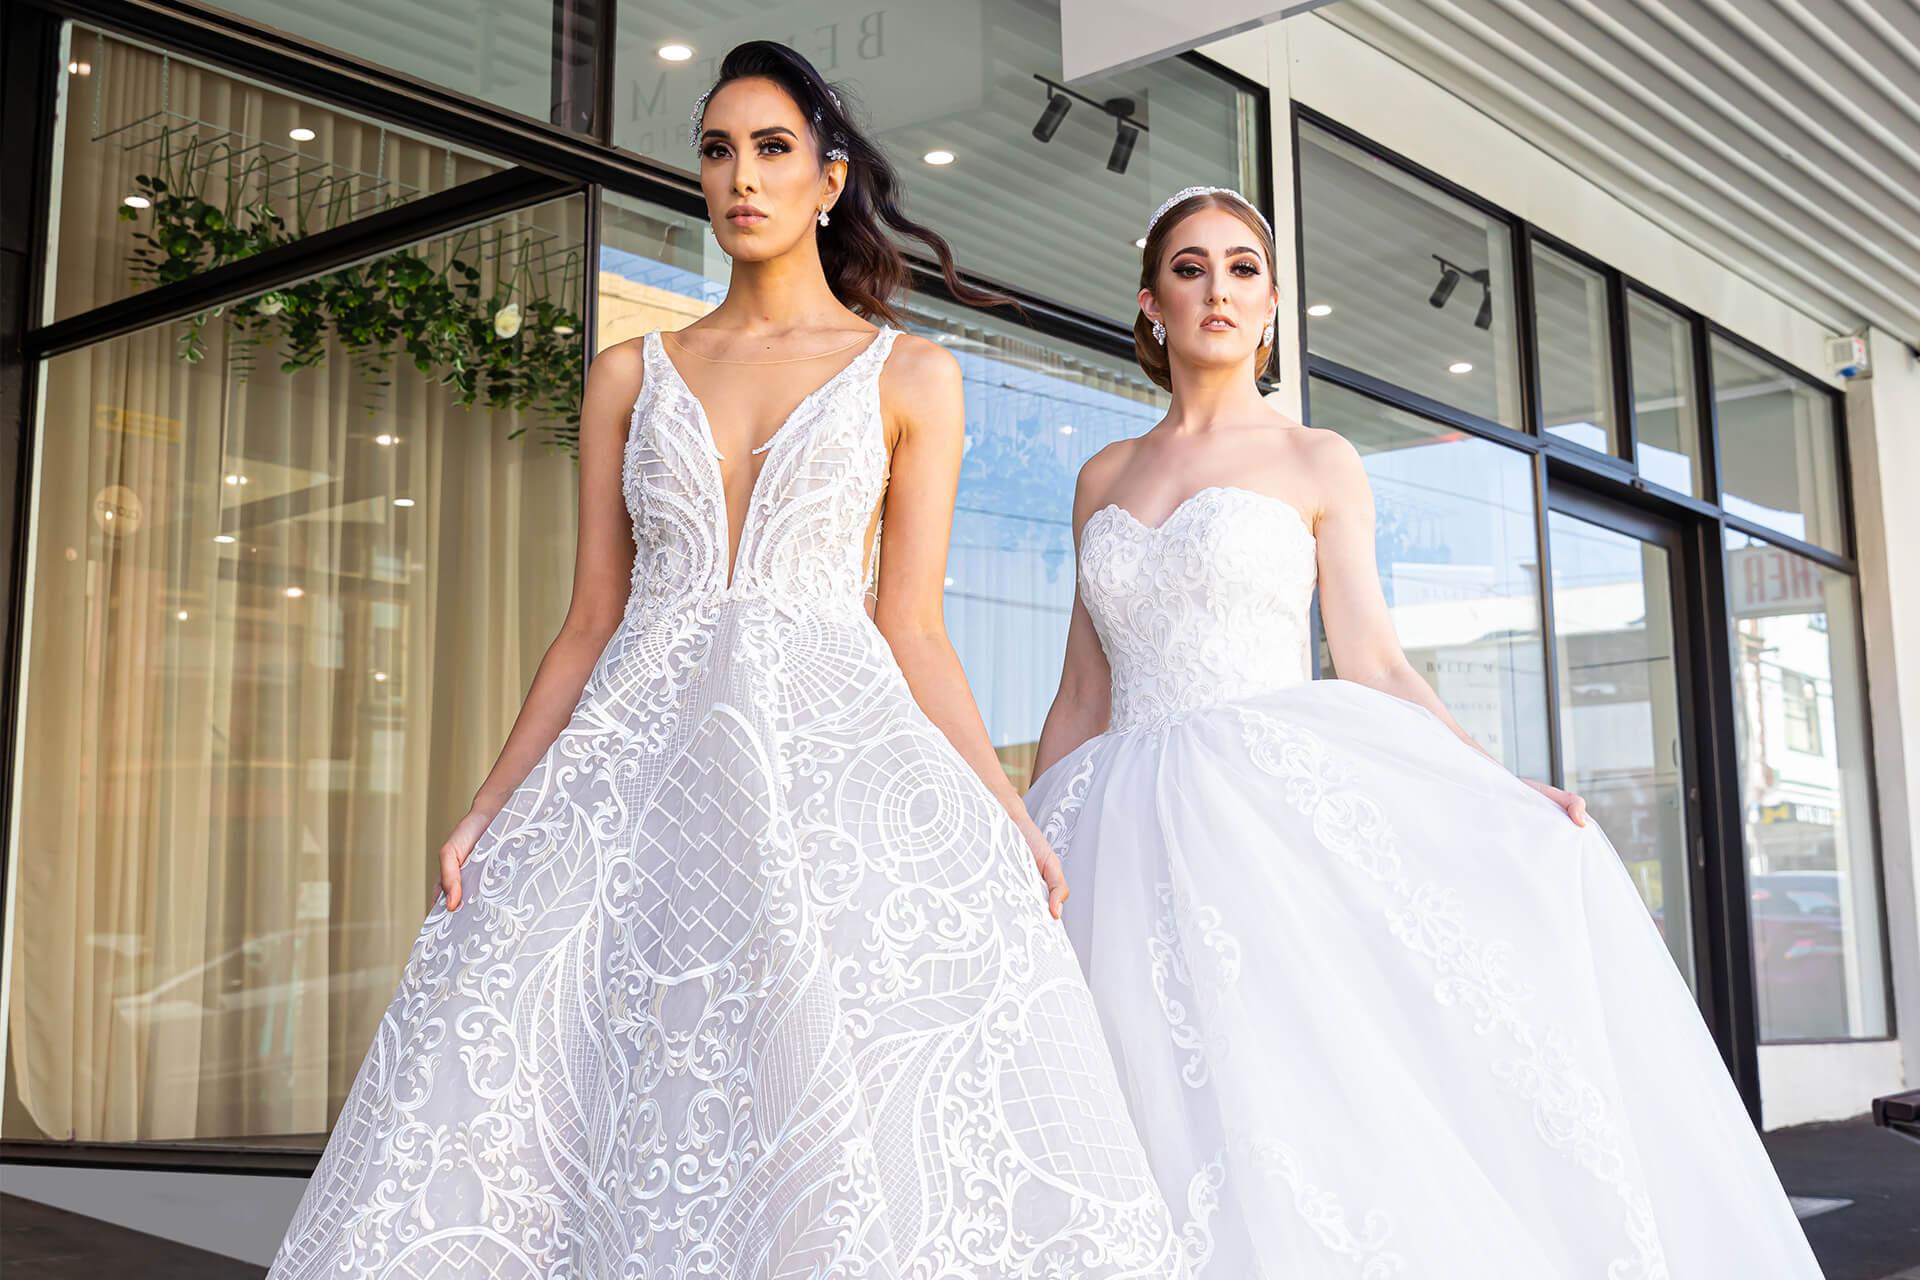 2 models in wedding dresses standing outside of Belle Mariee Bridal